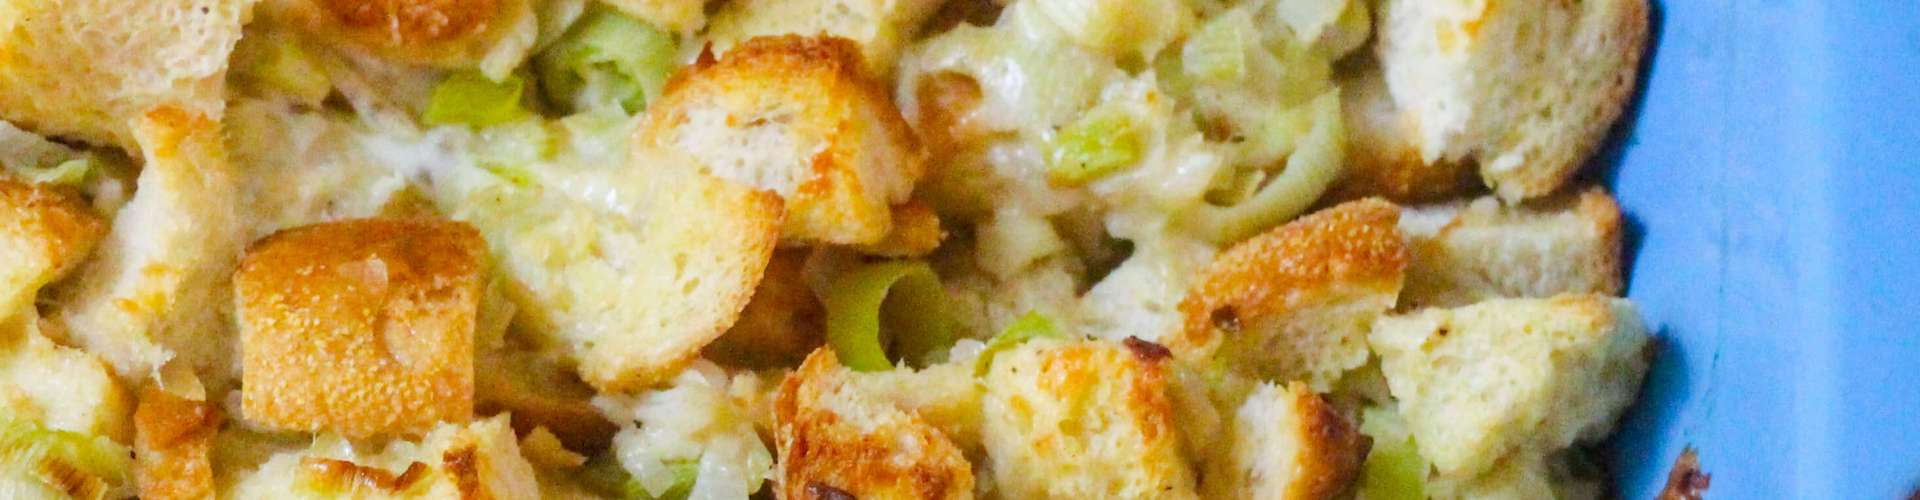 Cheesy Sourdough Stuffing